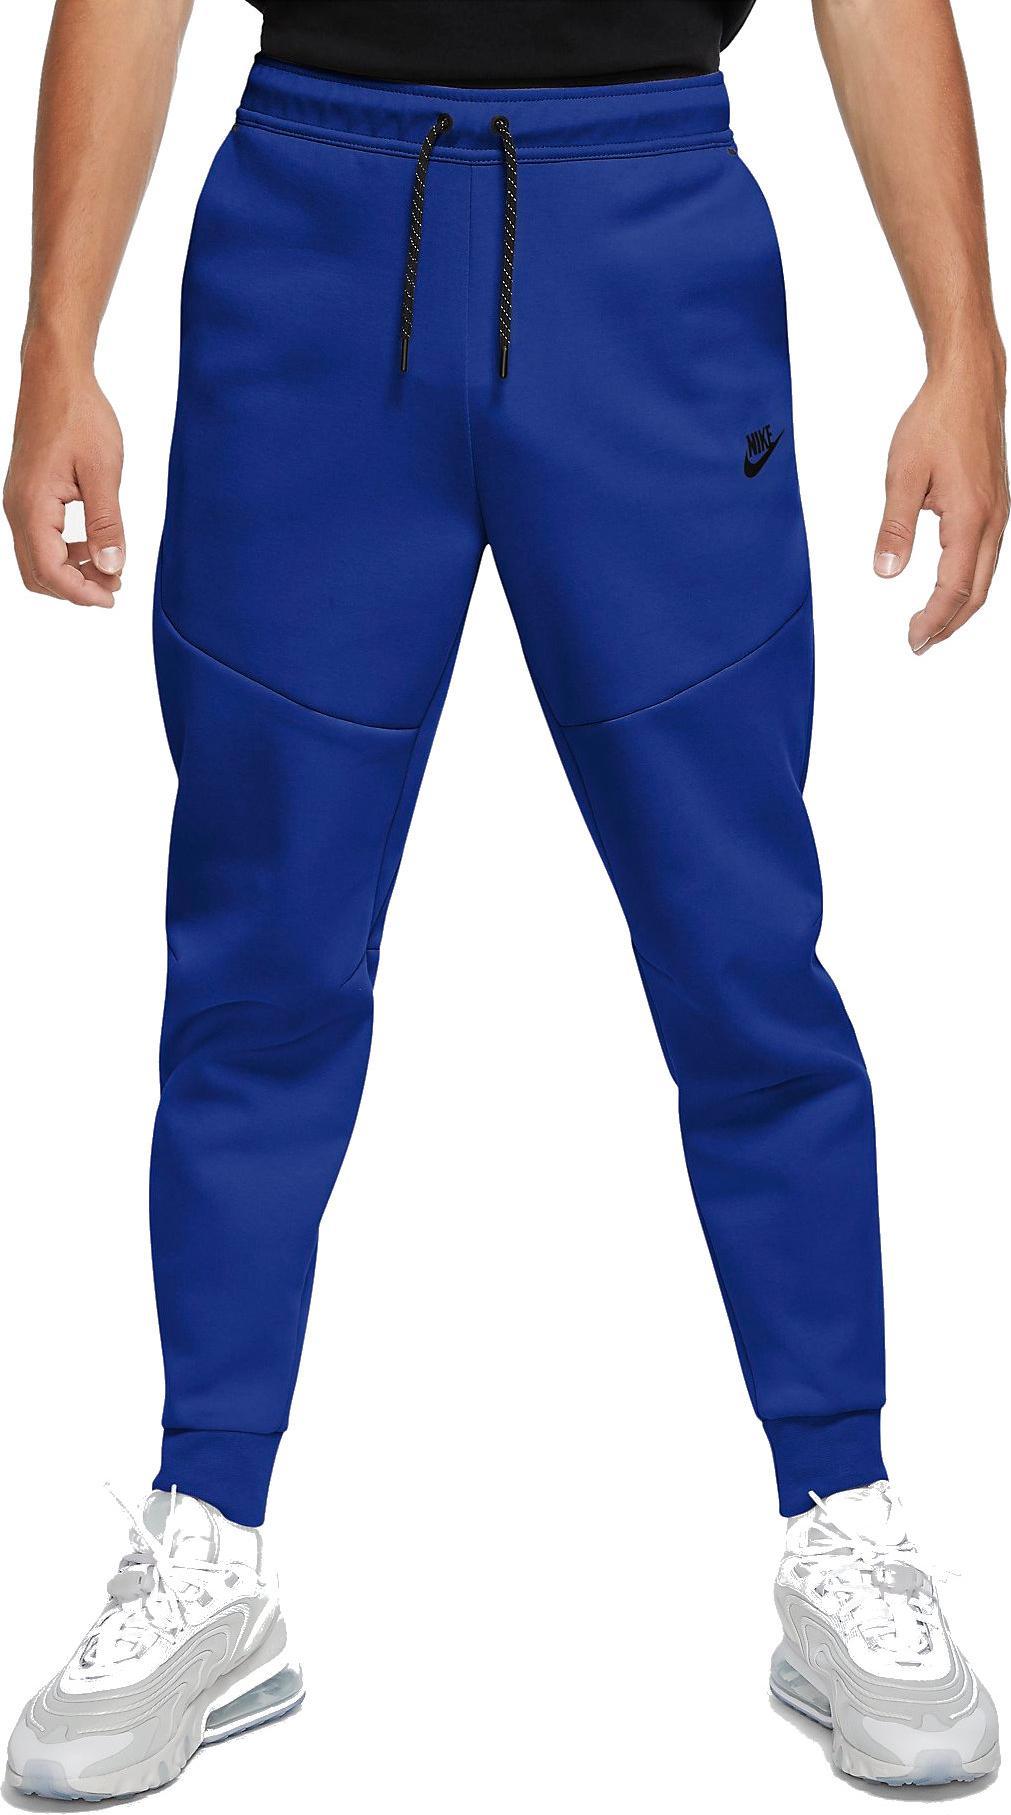 crema imán mudo  Pants Nike M NSW TECH FLEECE PANTS - Top4Fitness.com